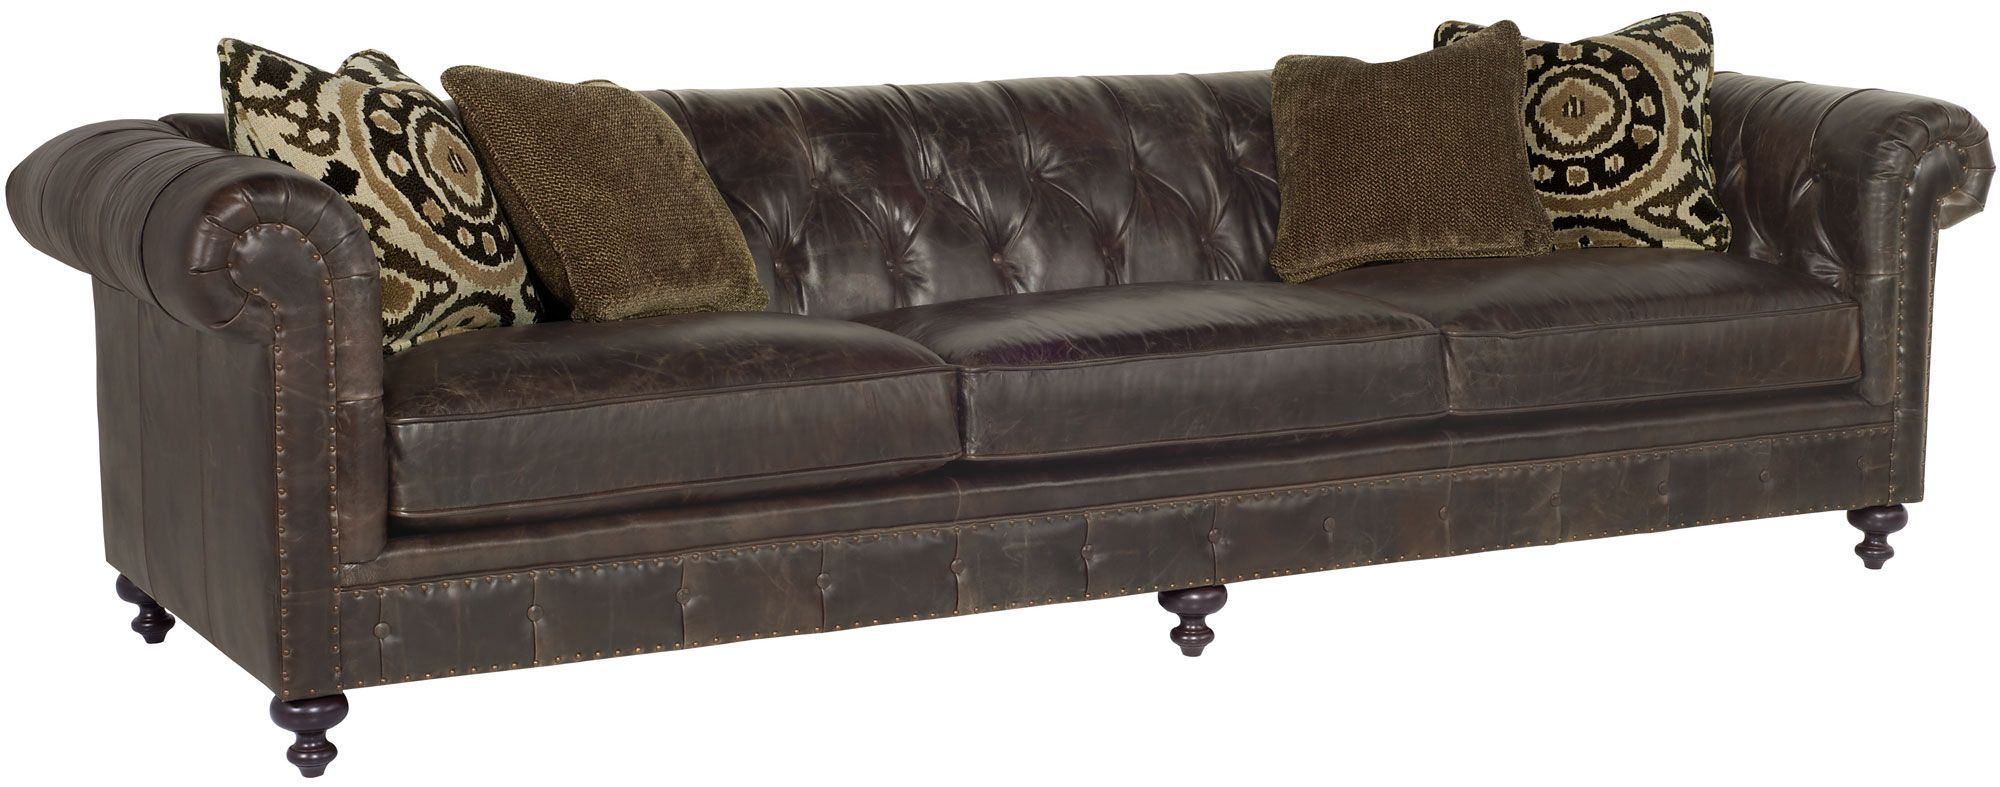 bernhardt riviera large sofa sectional sofas microfiber fabric 116 1 2 quot love